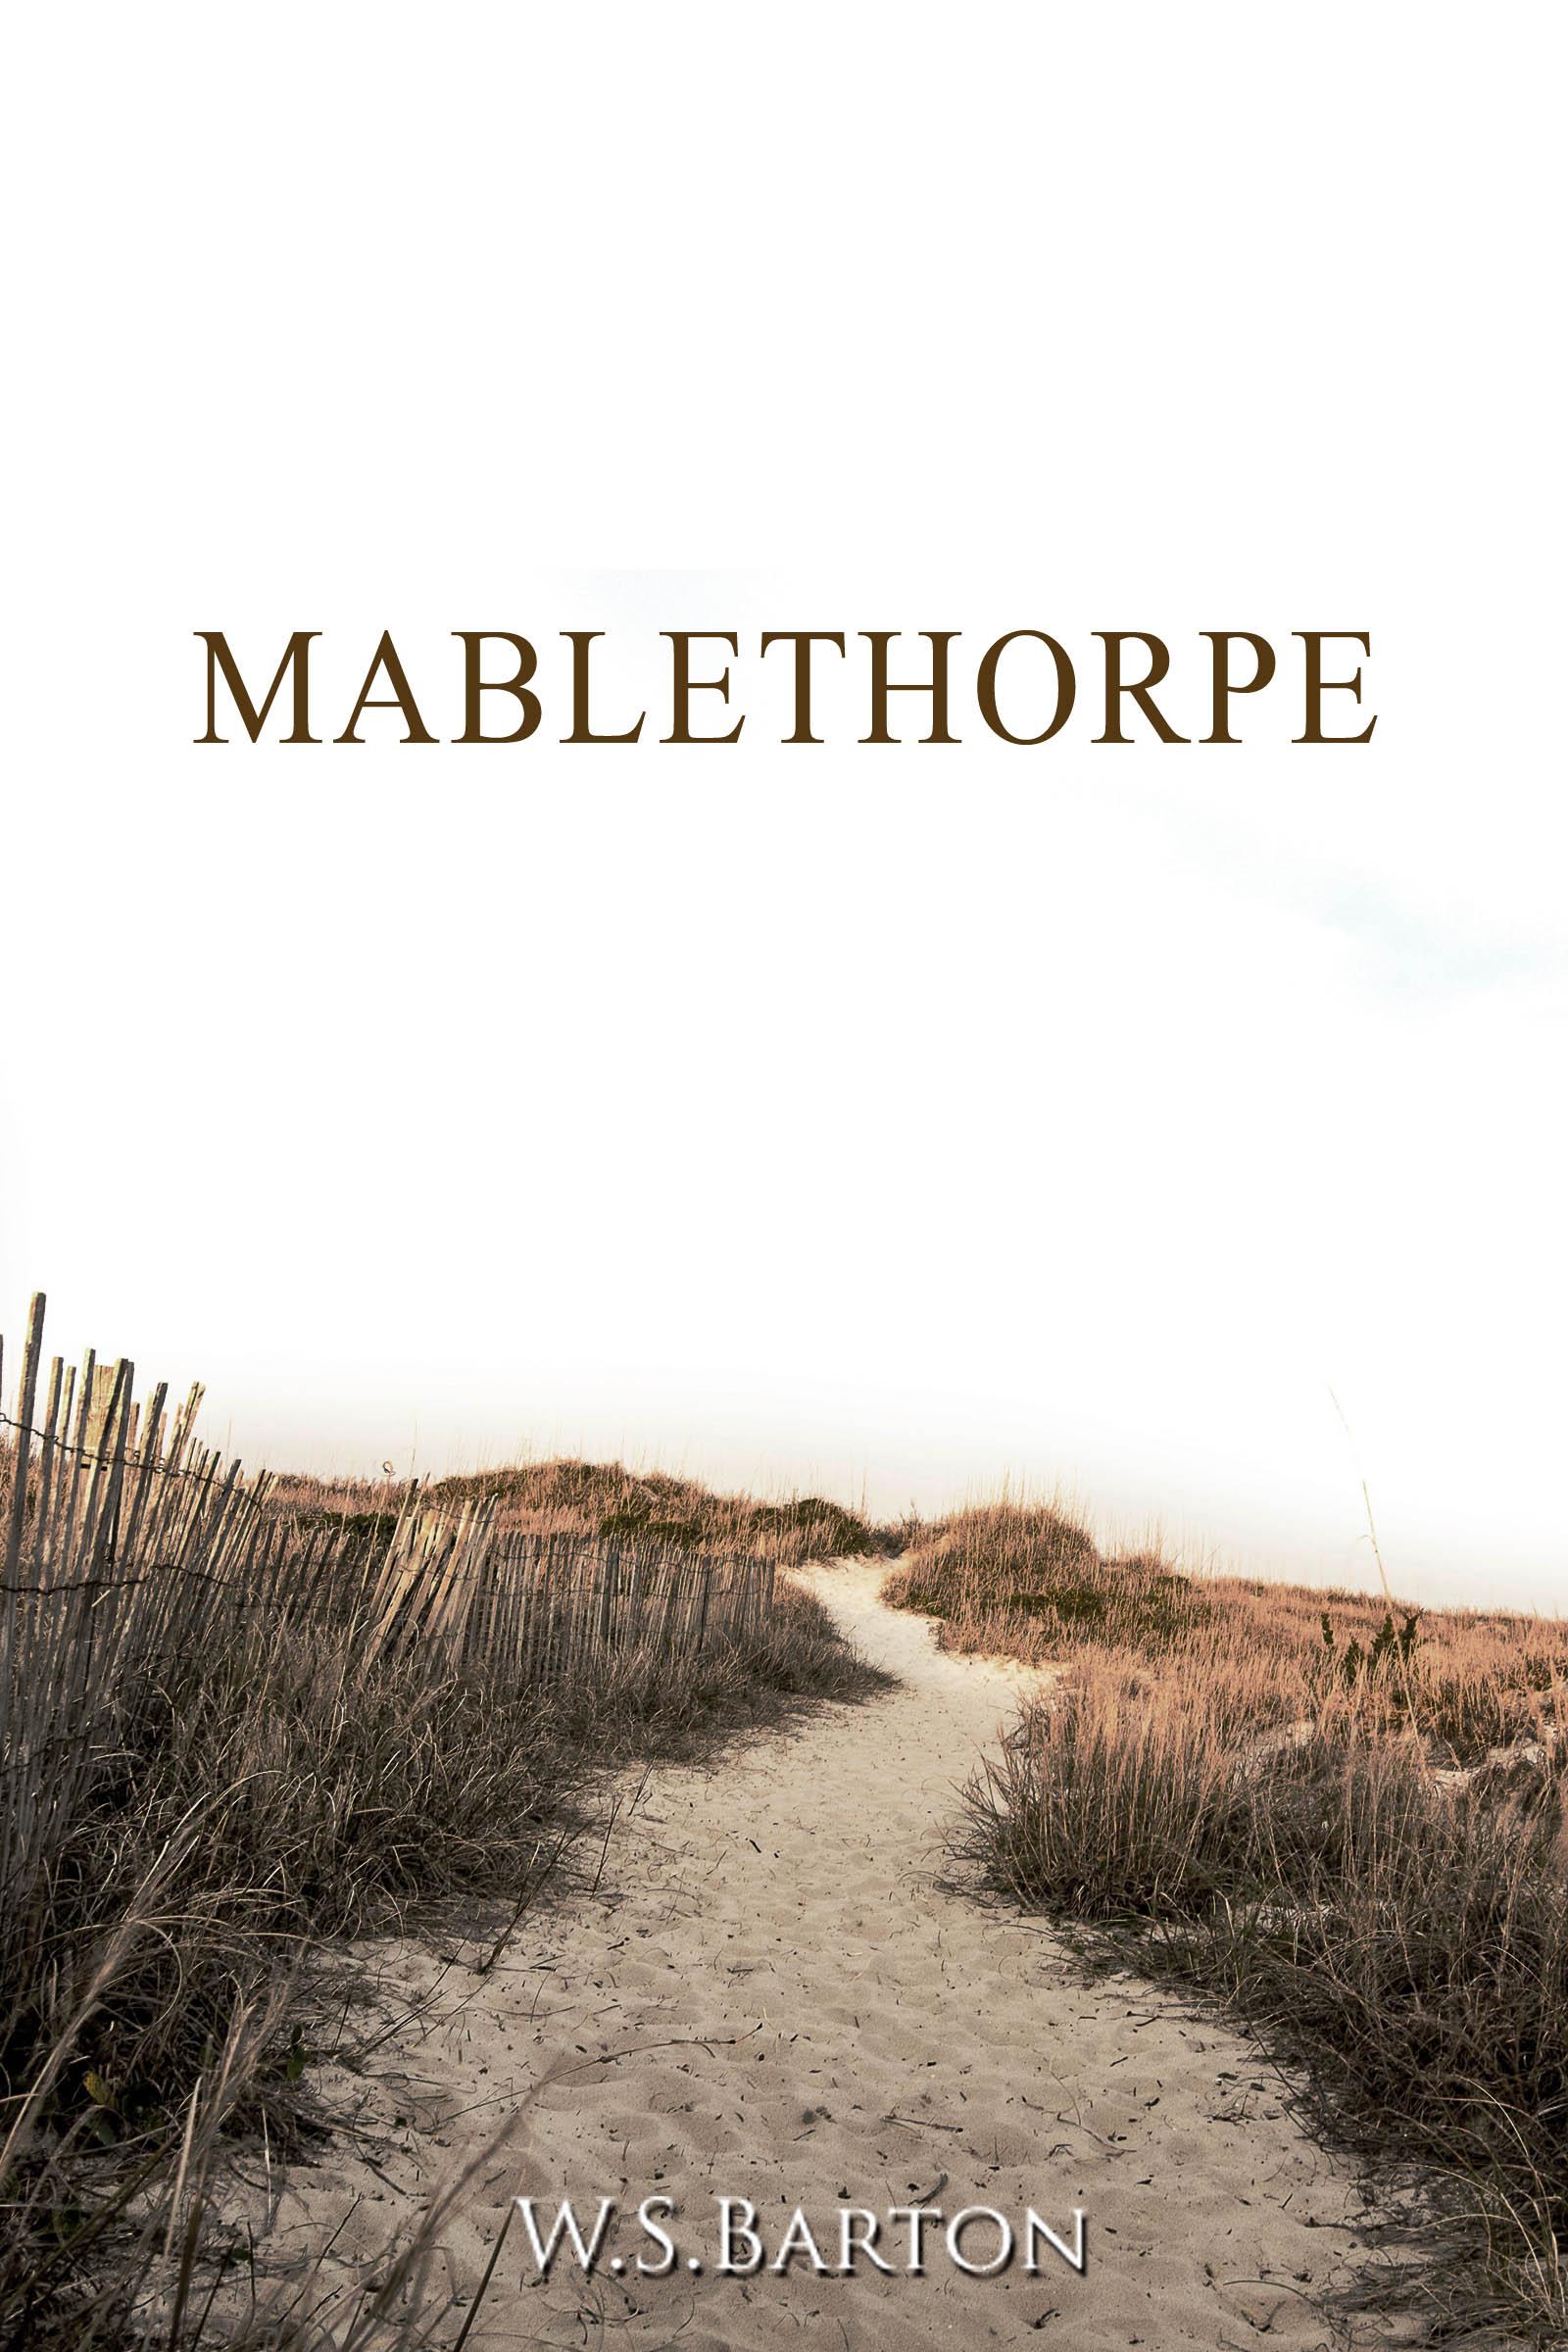 Mablethorpe Pre-Order